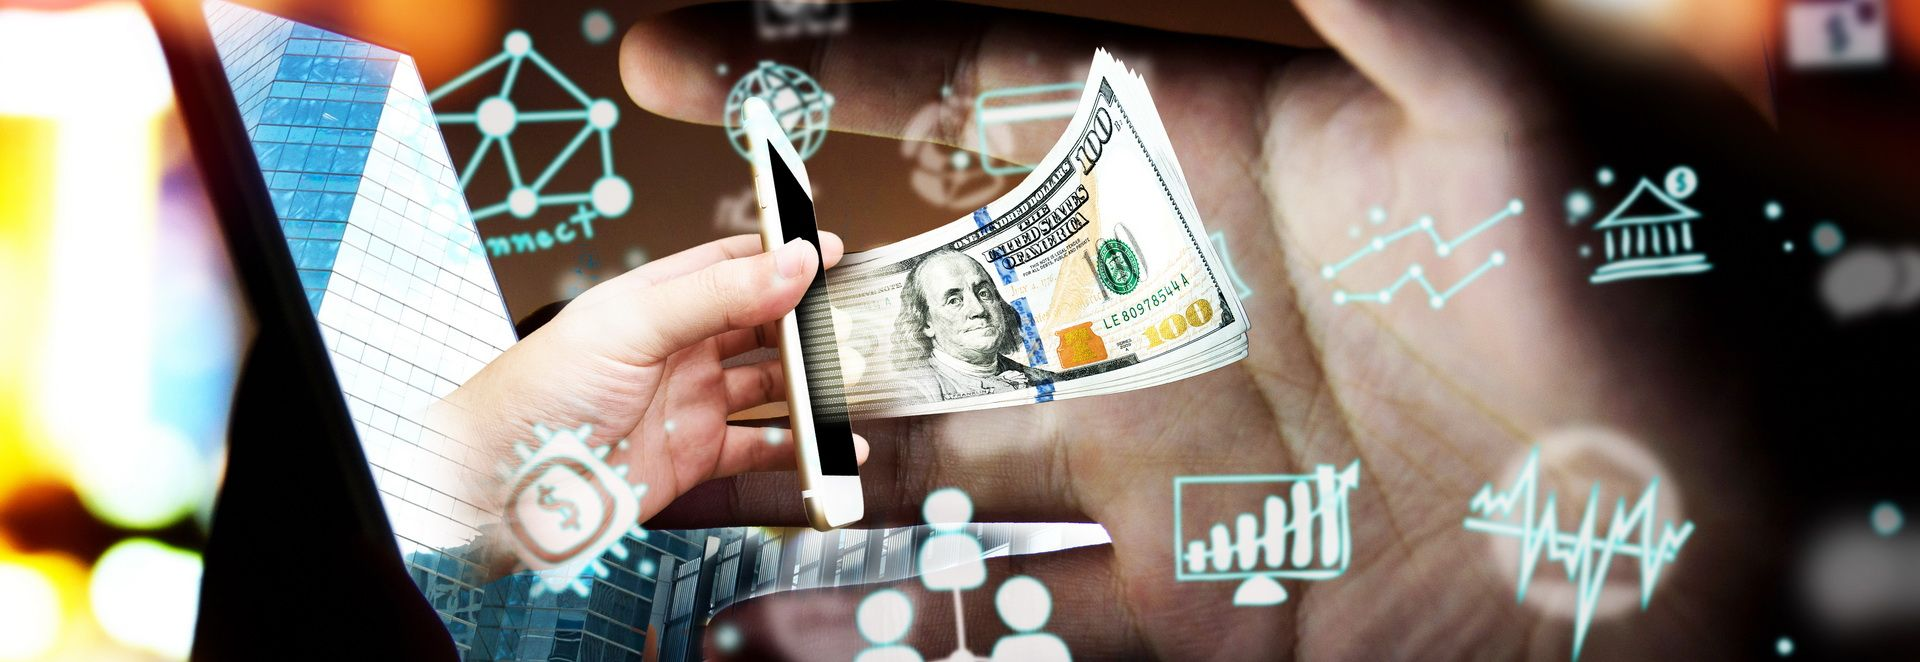 TelAviv Stock Exchange creates a blockchainbased